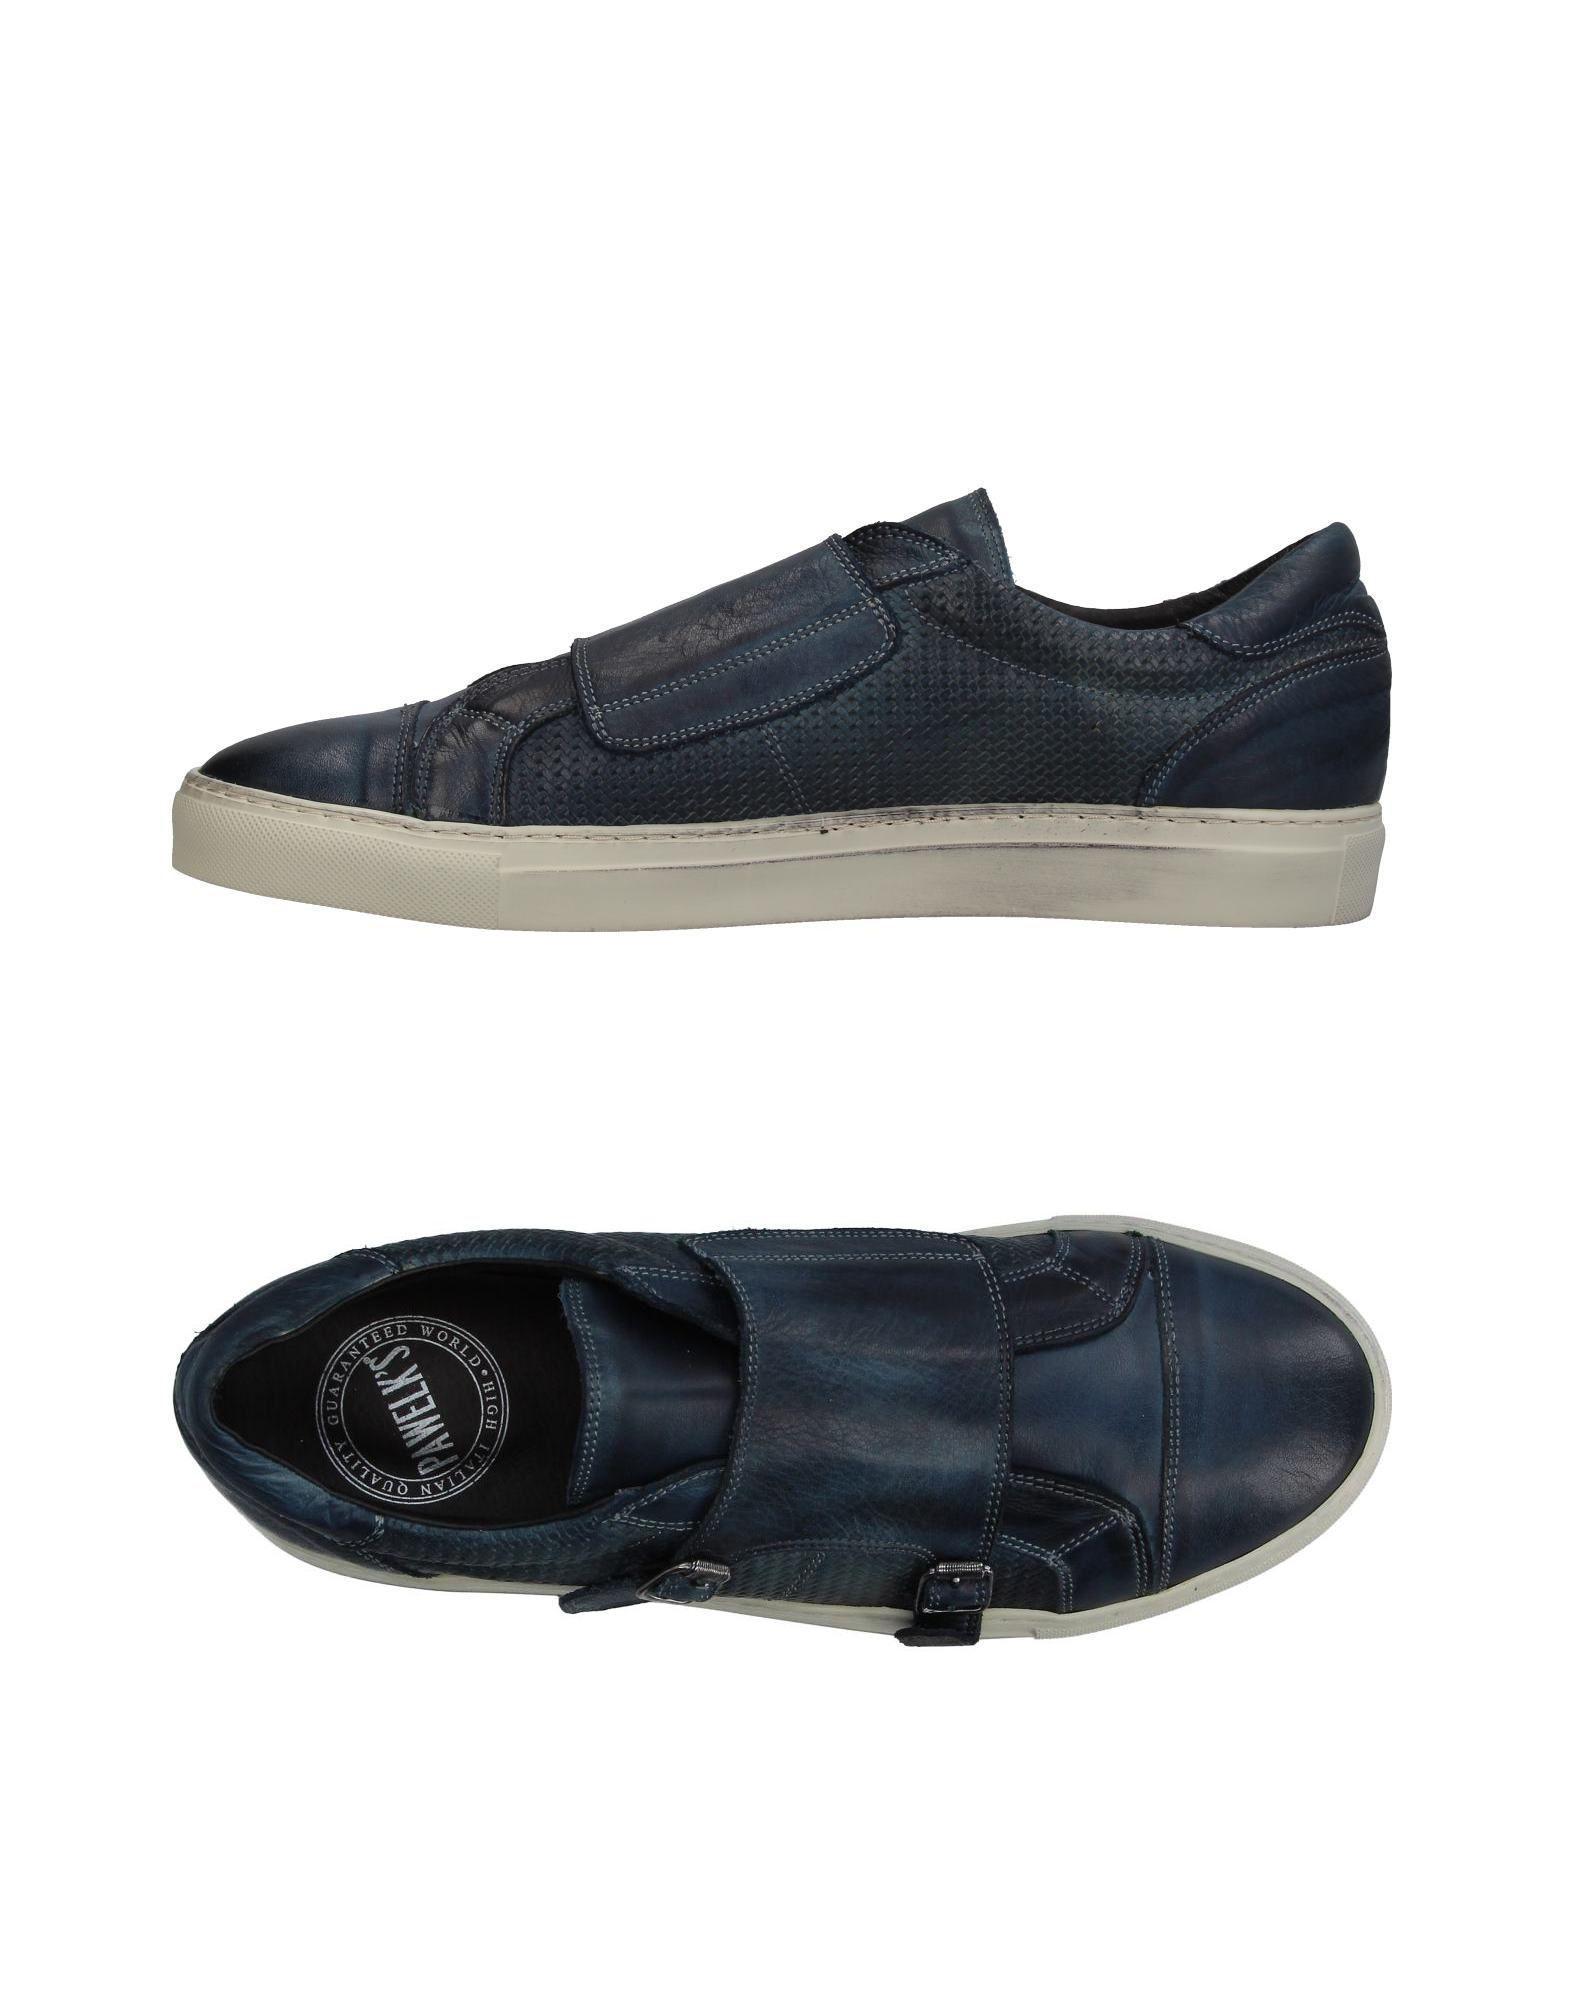 FOOTWEAR - Low-tops & sneakers on YOOX.COM Pawelk's dwJJvE